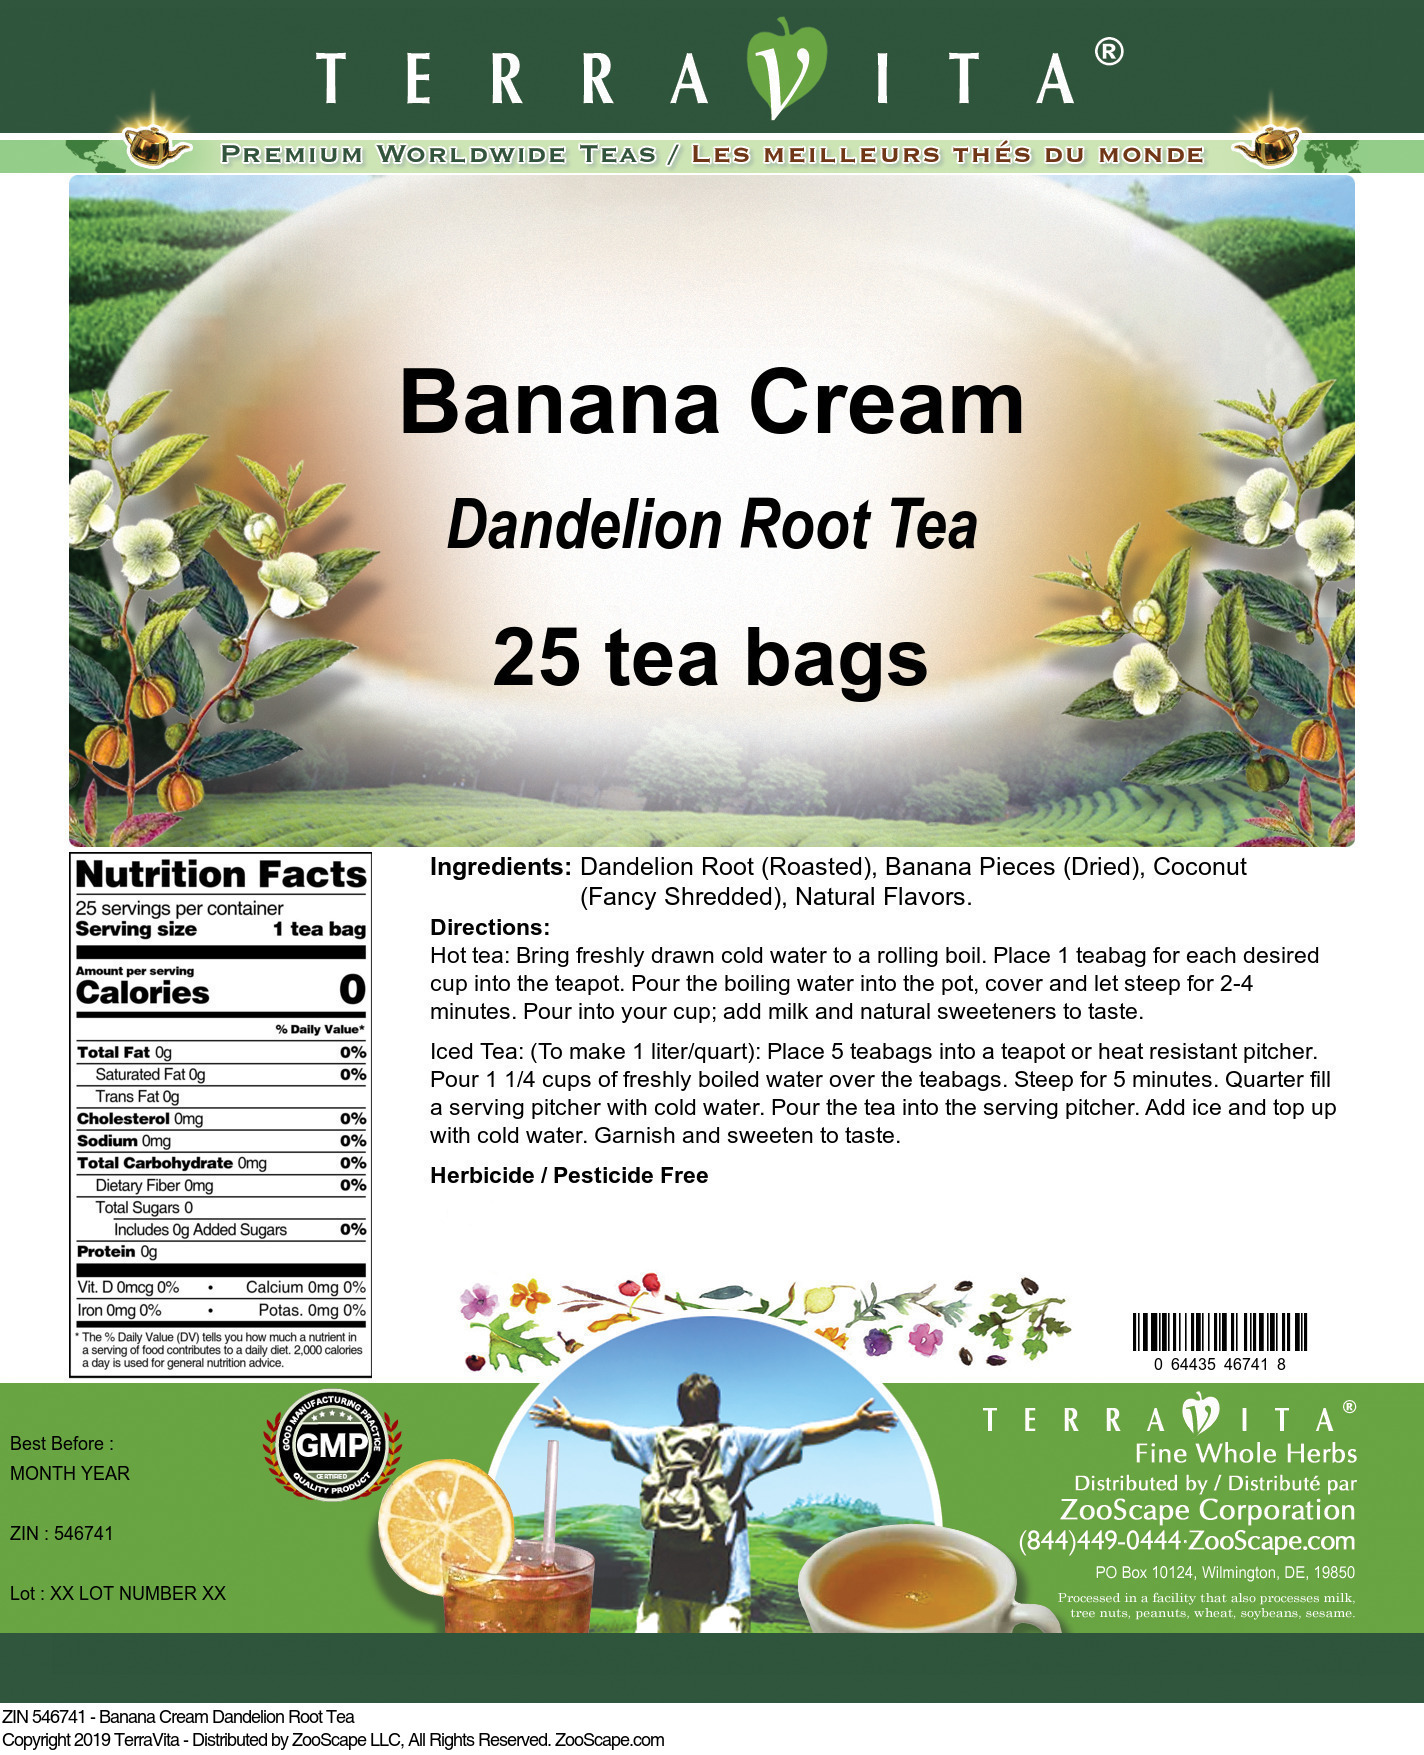 Banana Cream Dandelion Root